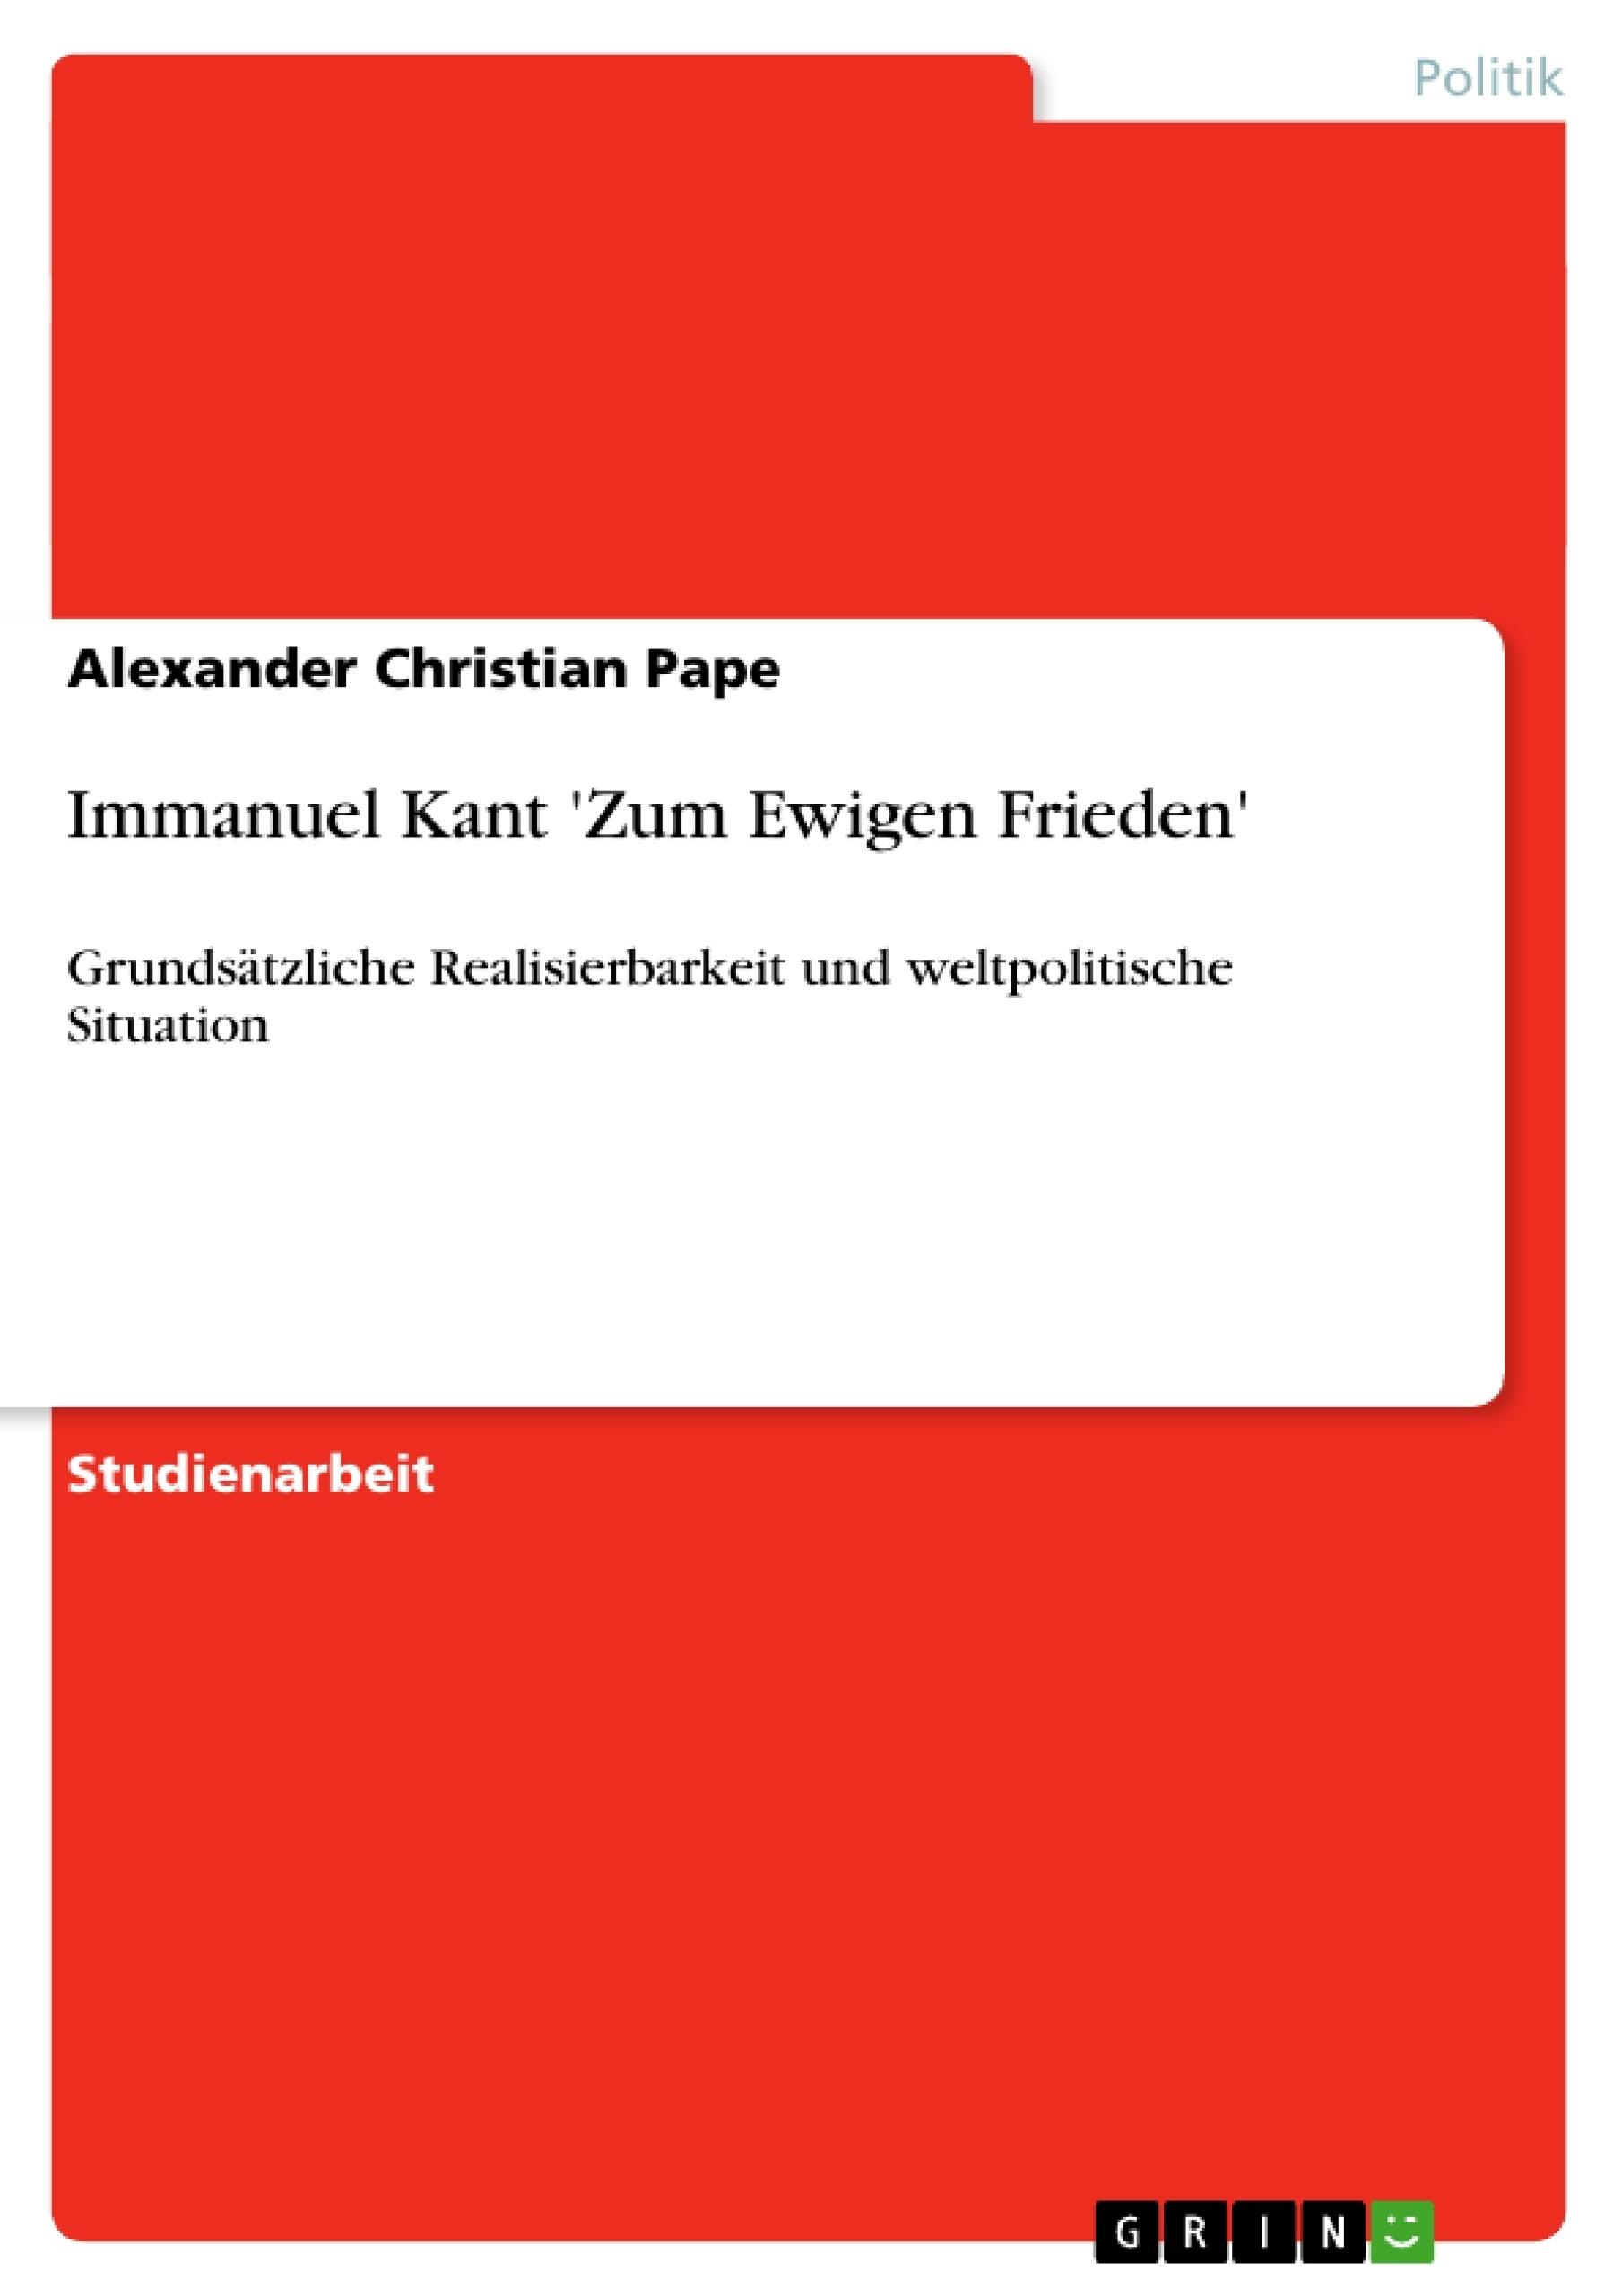 Titel: Immanuel Kant 'Zum Ewigen Frieden'